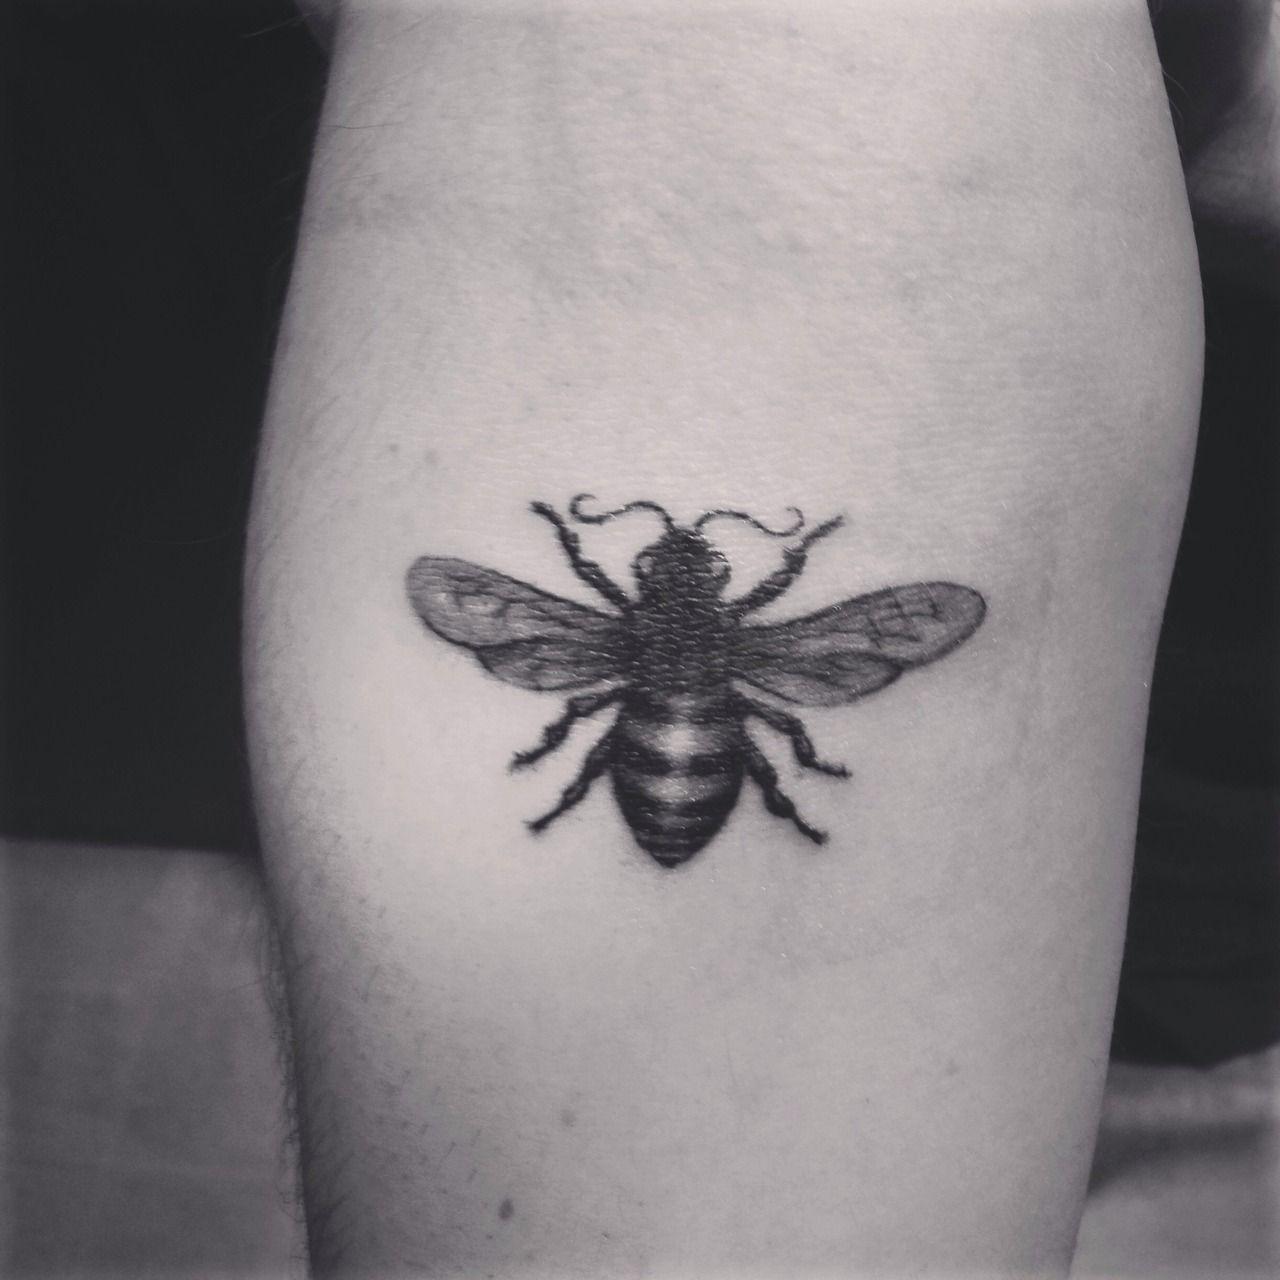 Honey Bee Tattoo By Sam King At Golden Spiral Greensboro NC USA